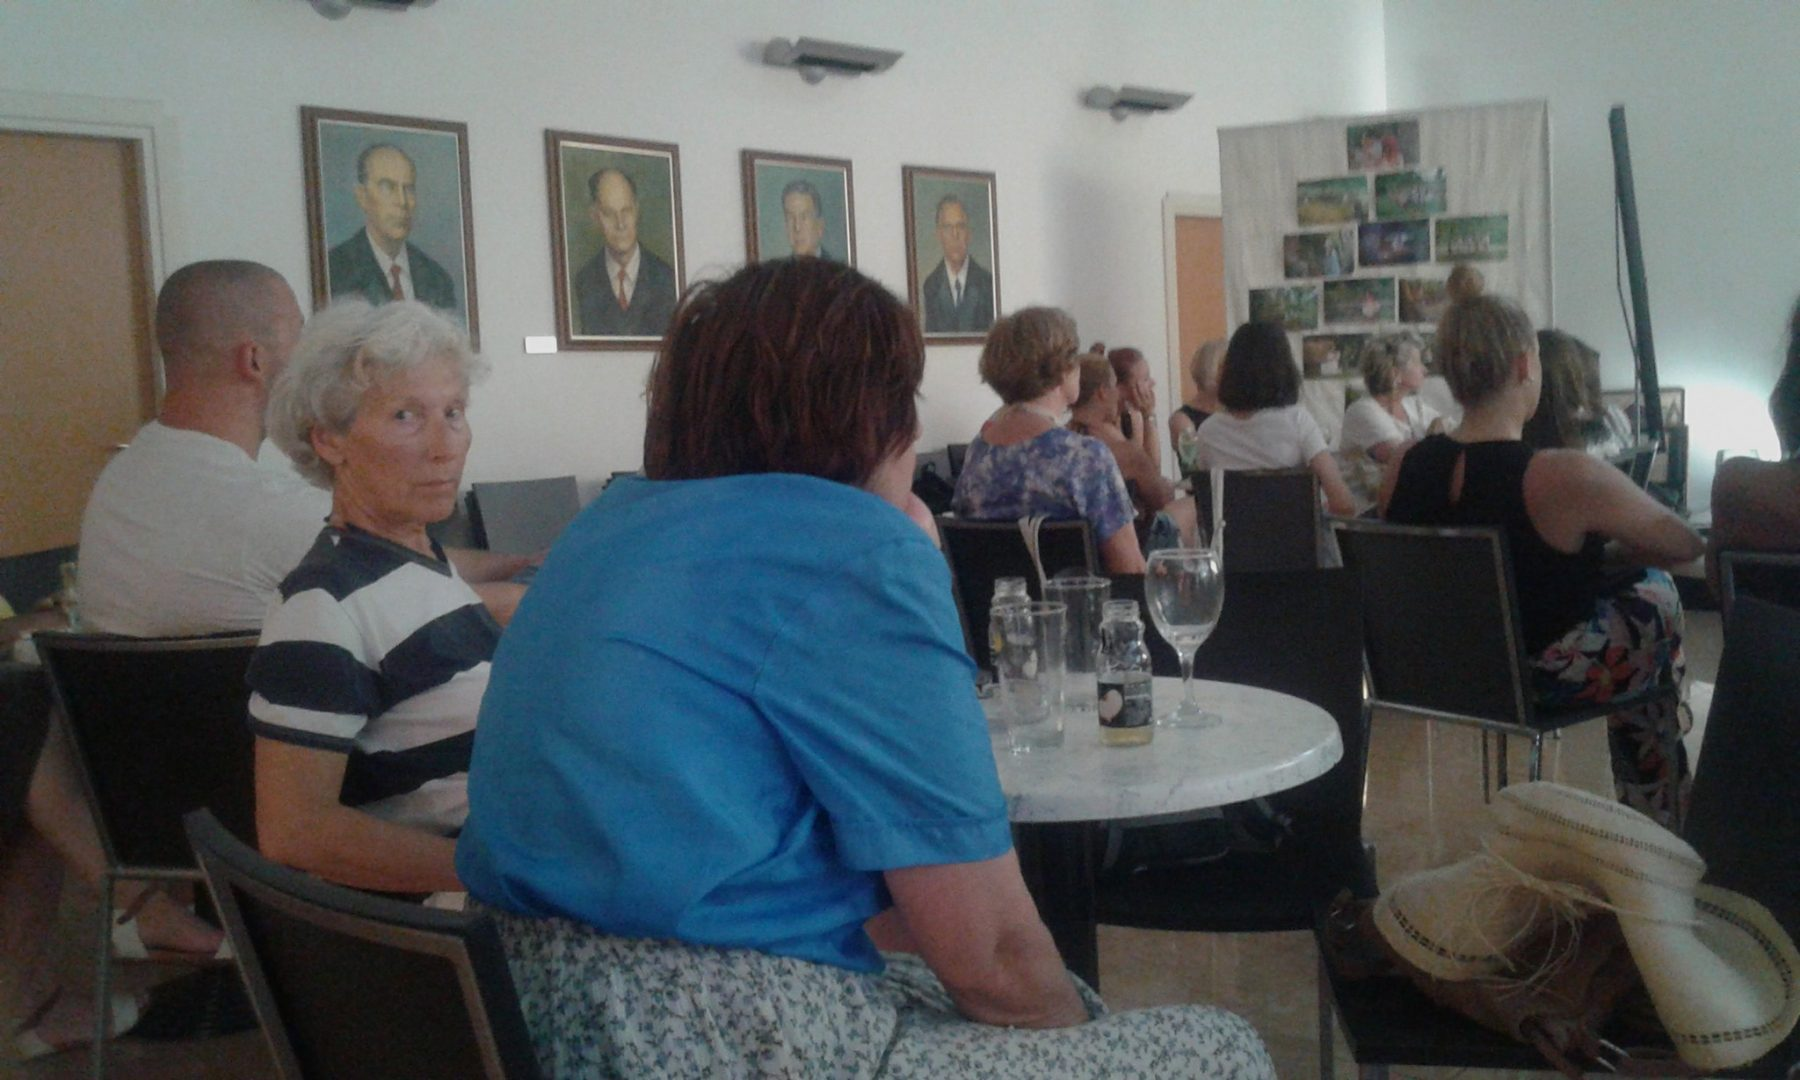 Izložba i predavanje na temu Poljičke vile...bilo je ugodno i lijepo